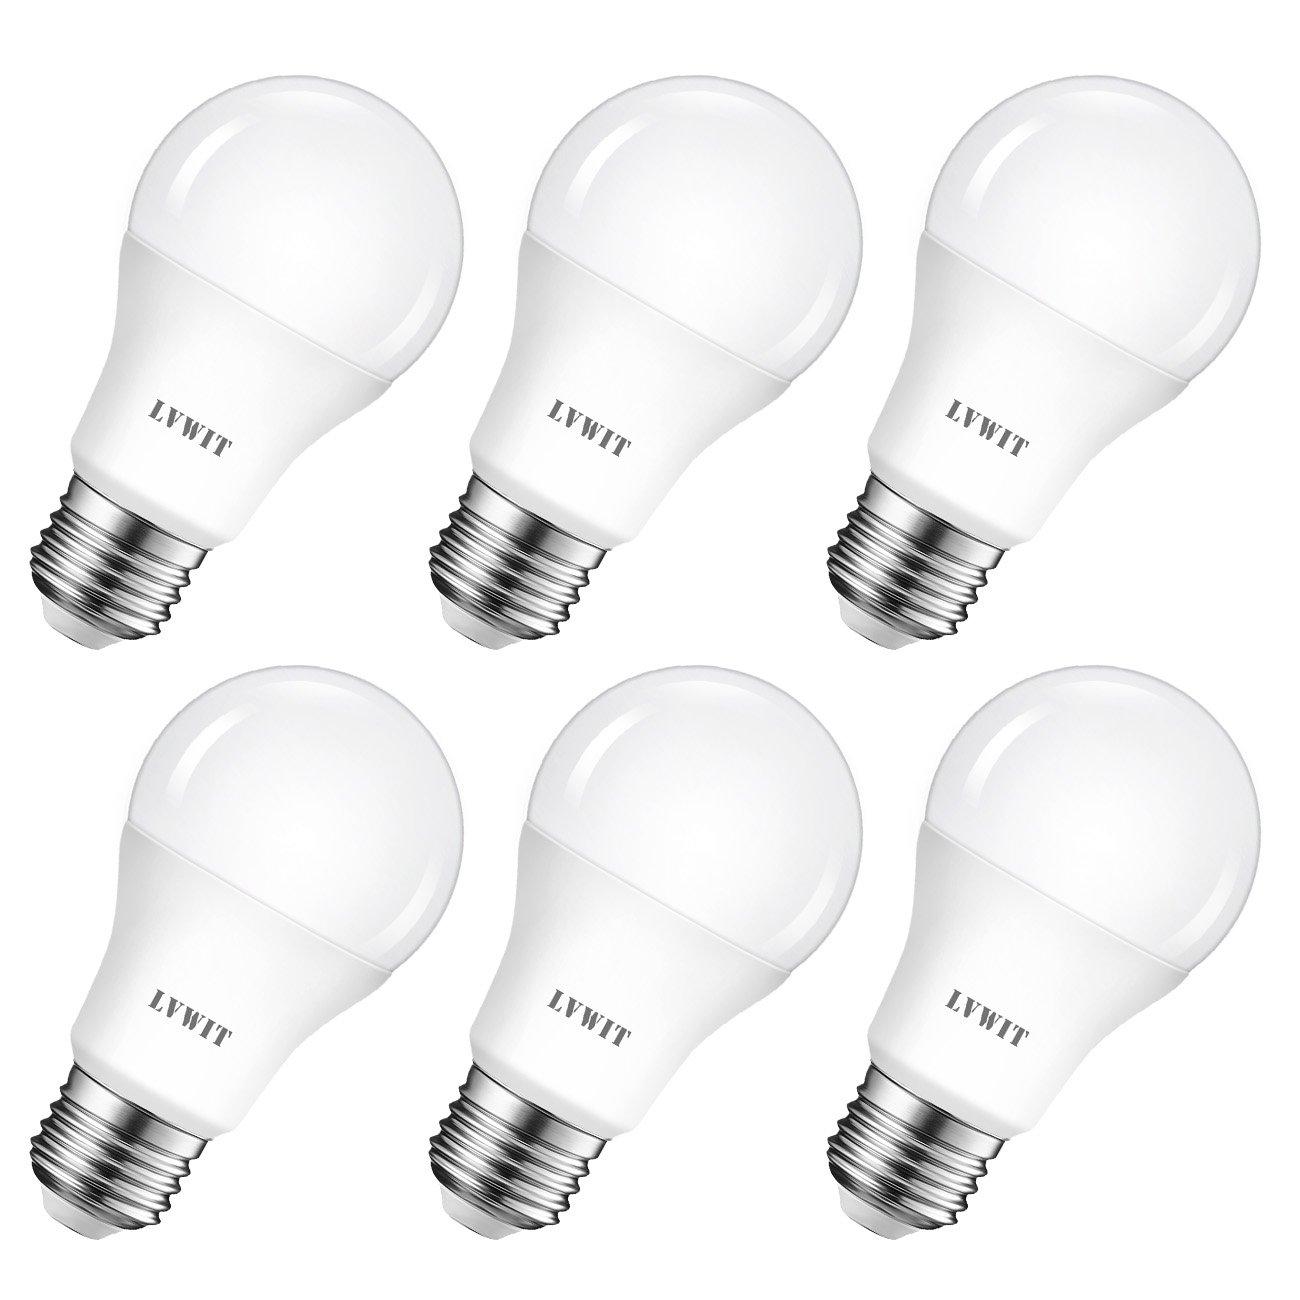 LVWIT Bombillas LED A60, Casquillo E27, 8.5W equivalente a 60W, 2700K Luz Blanca Cálidoa, 806 lm, Bajo consumo, No regulable - Pack de 6 Unidades.